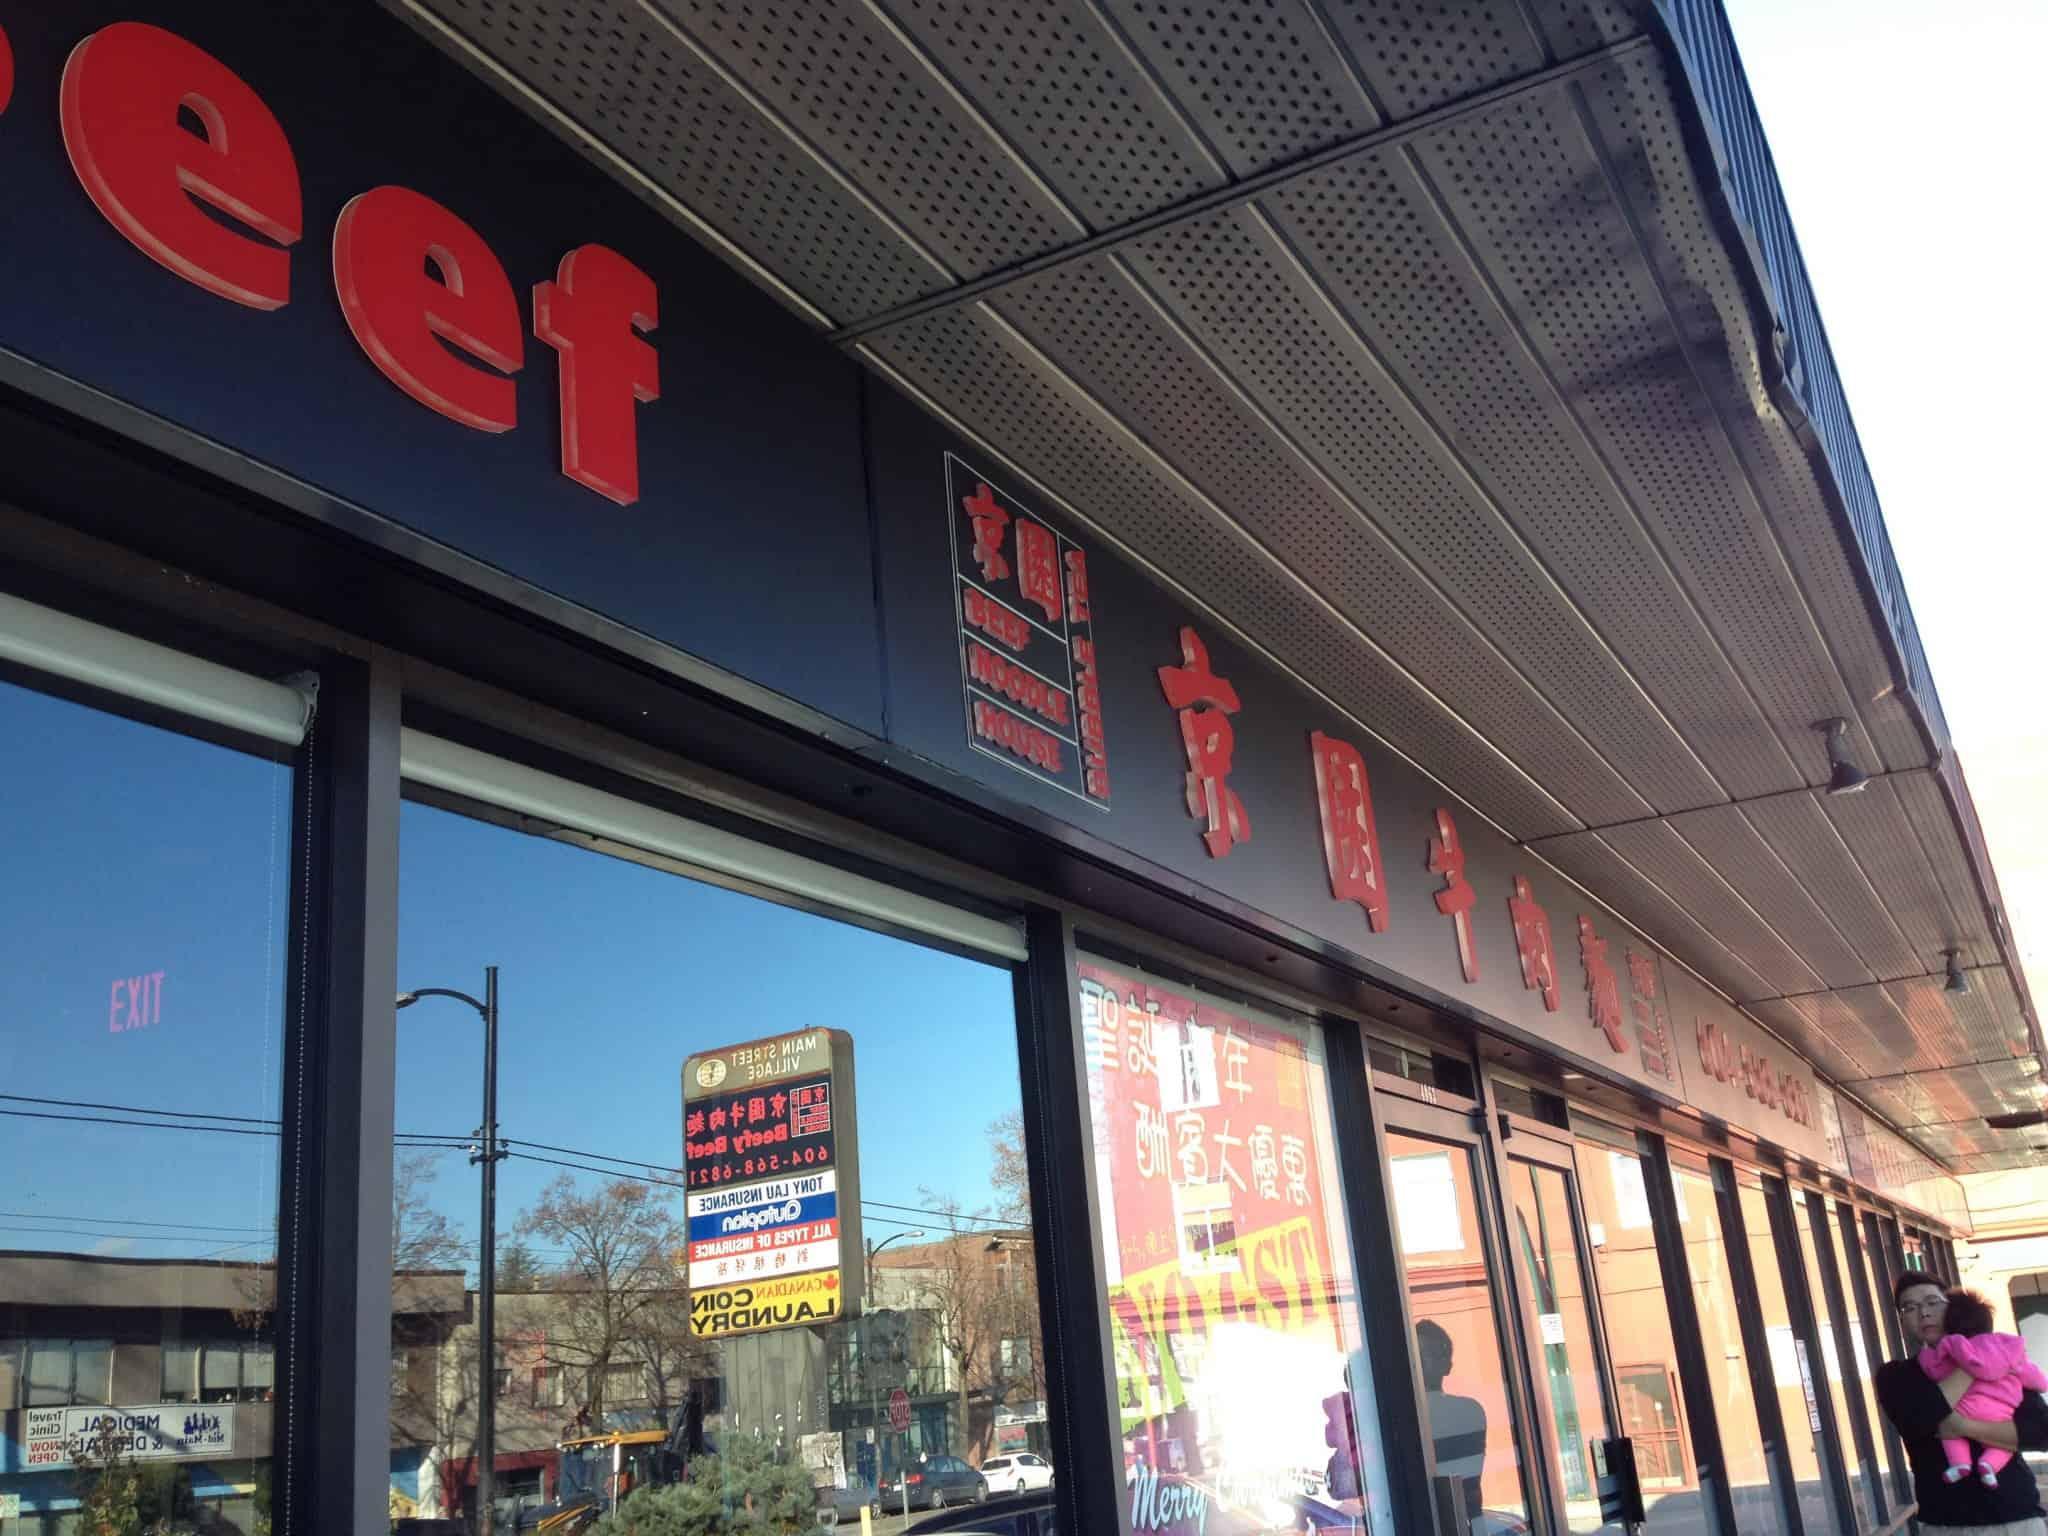 Beefy Beef Noodle House 京園牛肉麵, Vancouver (Riley Park)